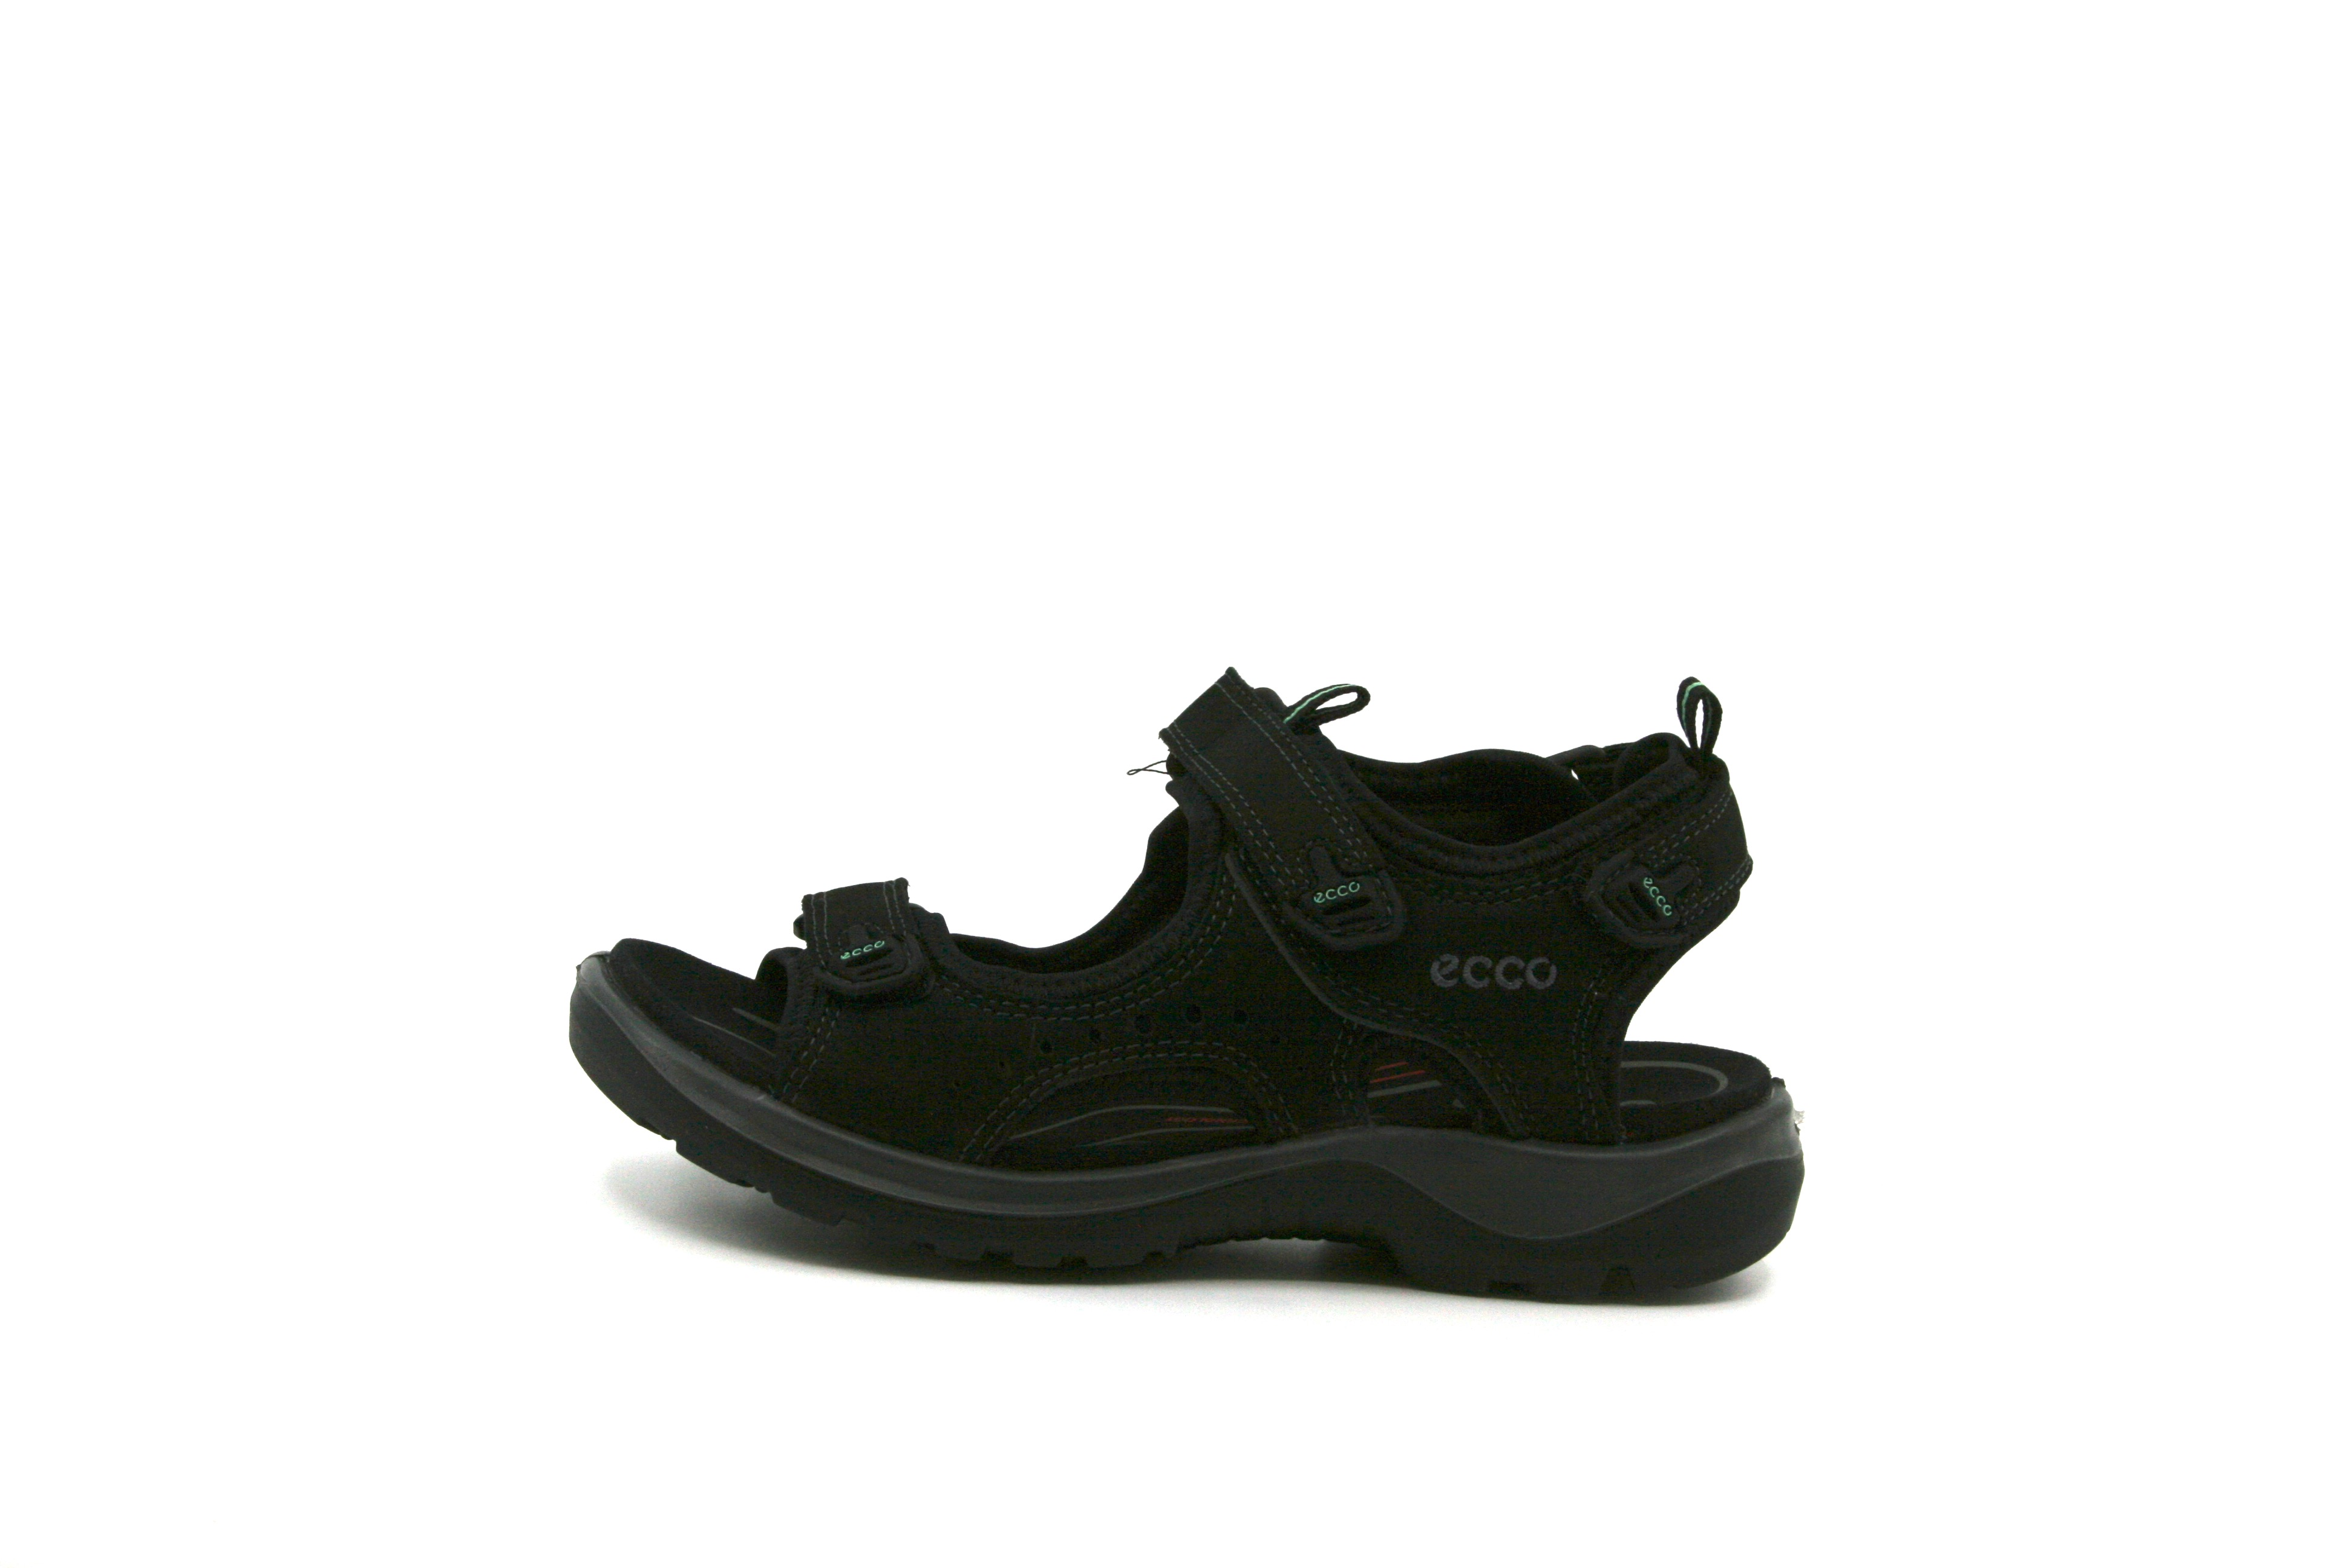 5698675a0ae Damkjaer Sko Online Shop - Ecco Sandal Dame Sort